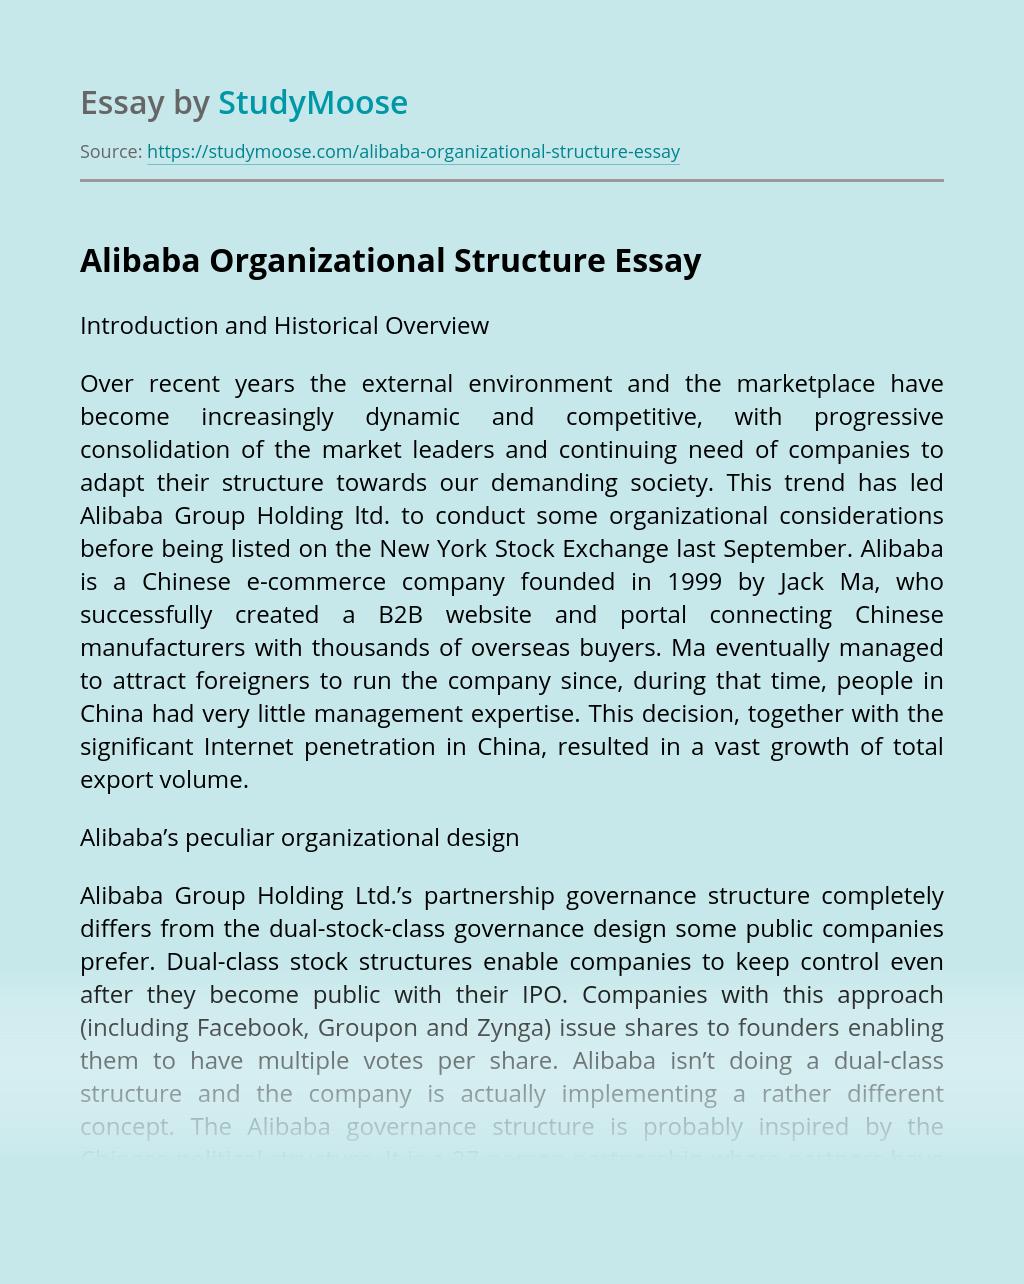 Alibaba Organizational Structure